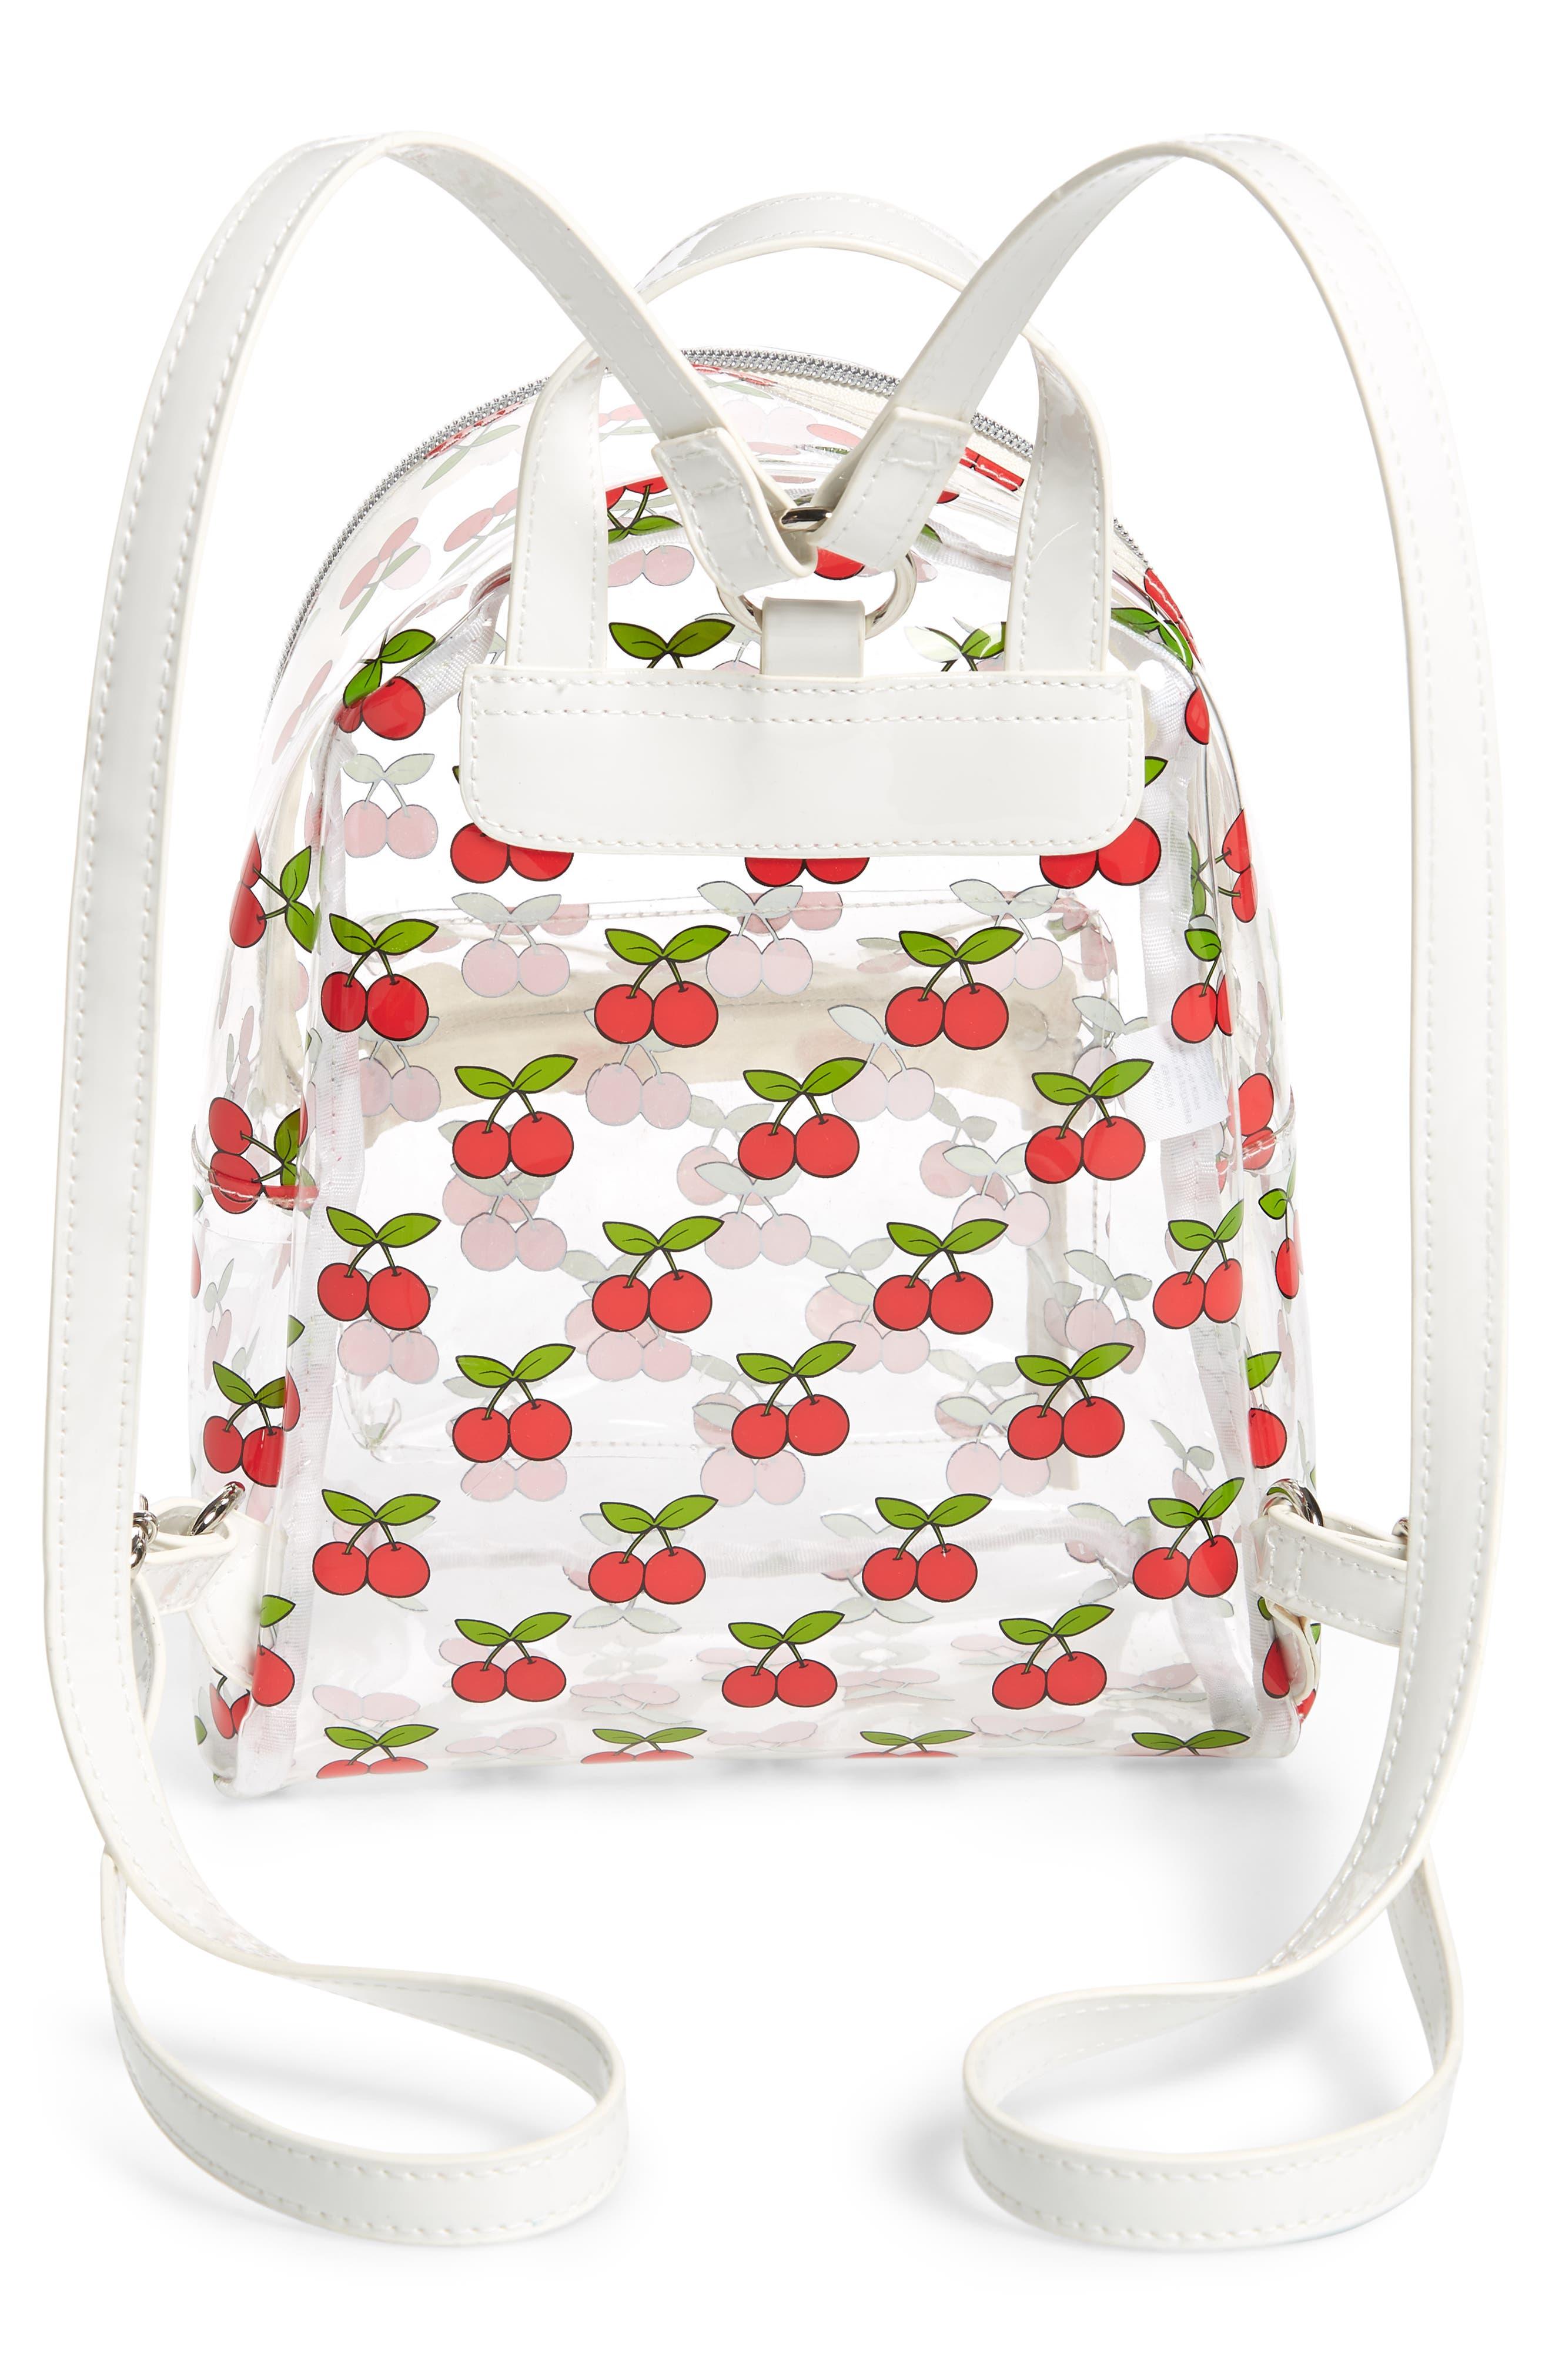 Transparent Cherry Print Mini Convertible Backpack,                             Alternate thumbnail 3, color,                             600